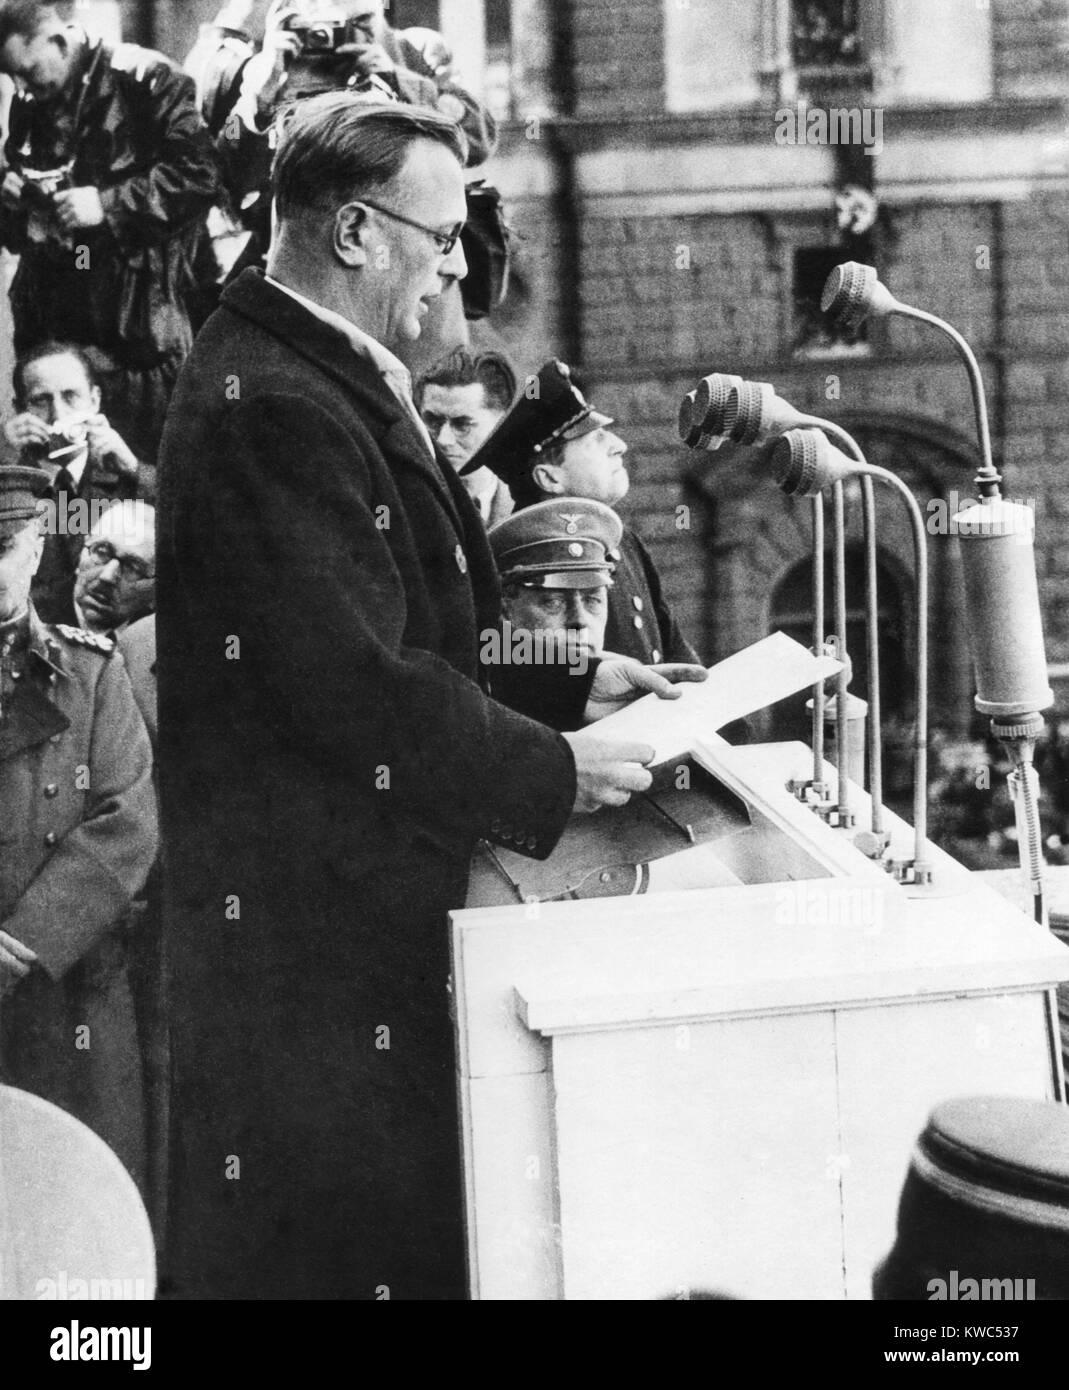 Arthur Seyss-Inquart was Chancellor of Austria for two days before the German annexation of Austria. The Austria Stock Photo